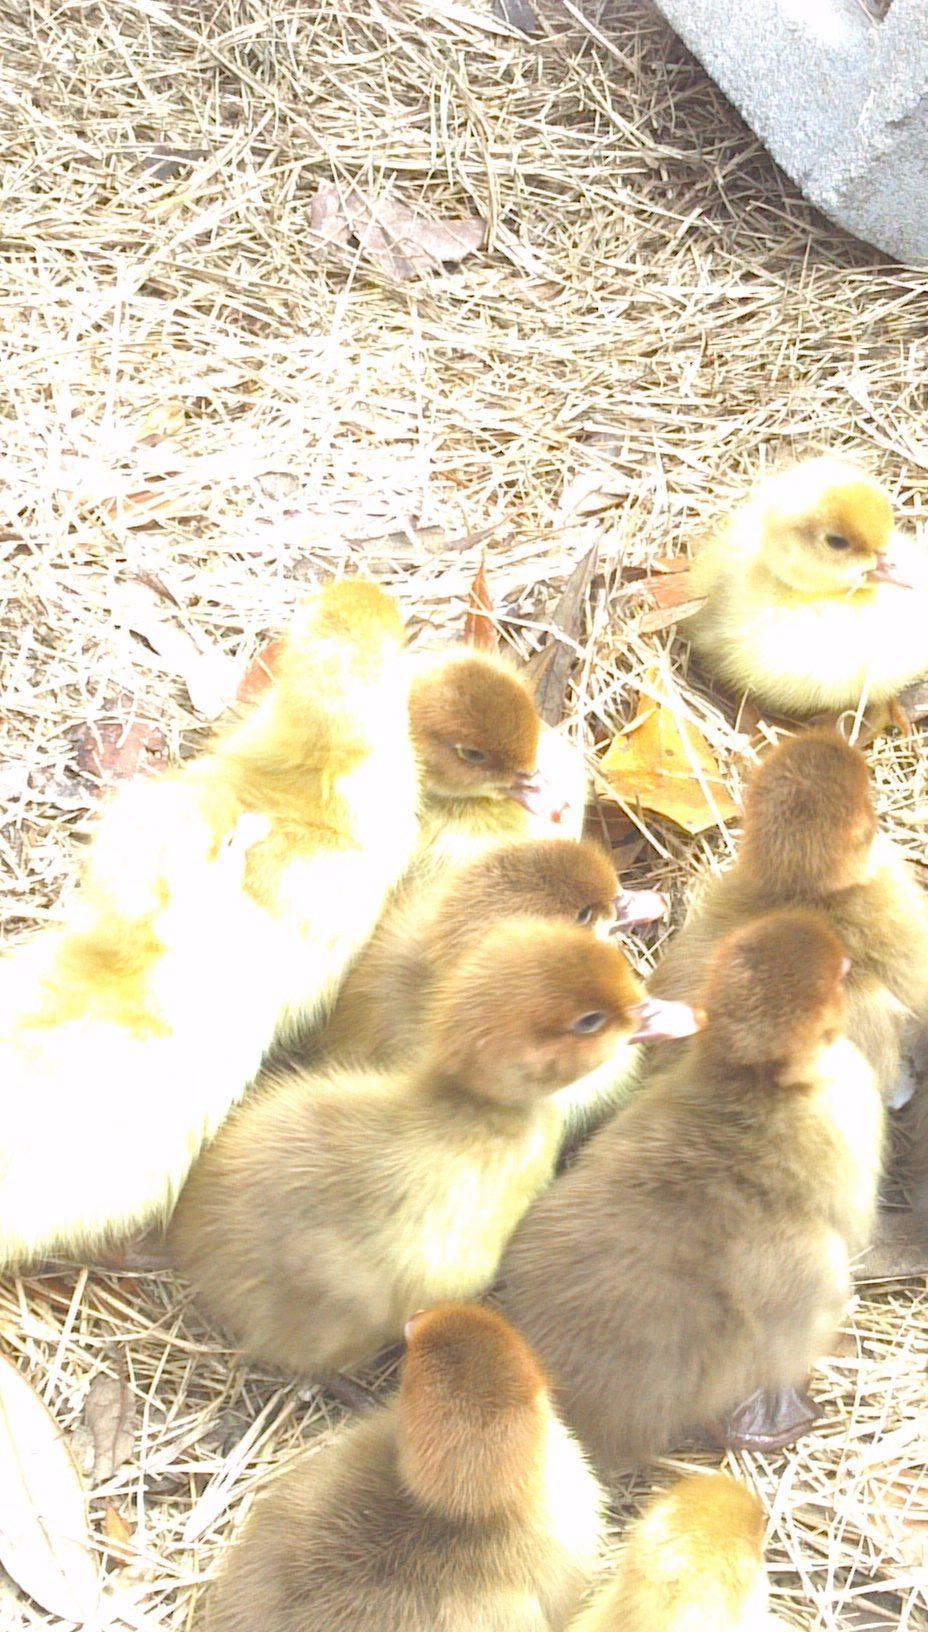 ducklings central florida backyard chickens